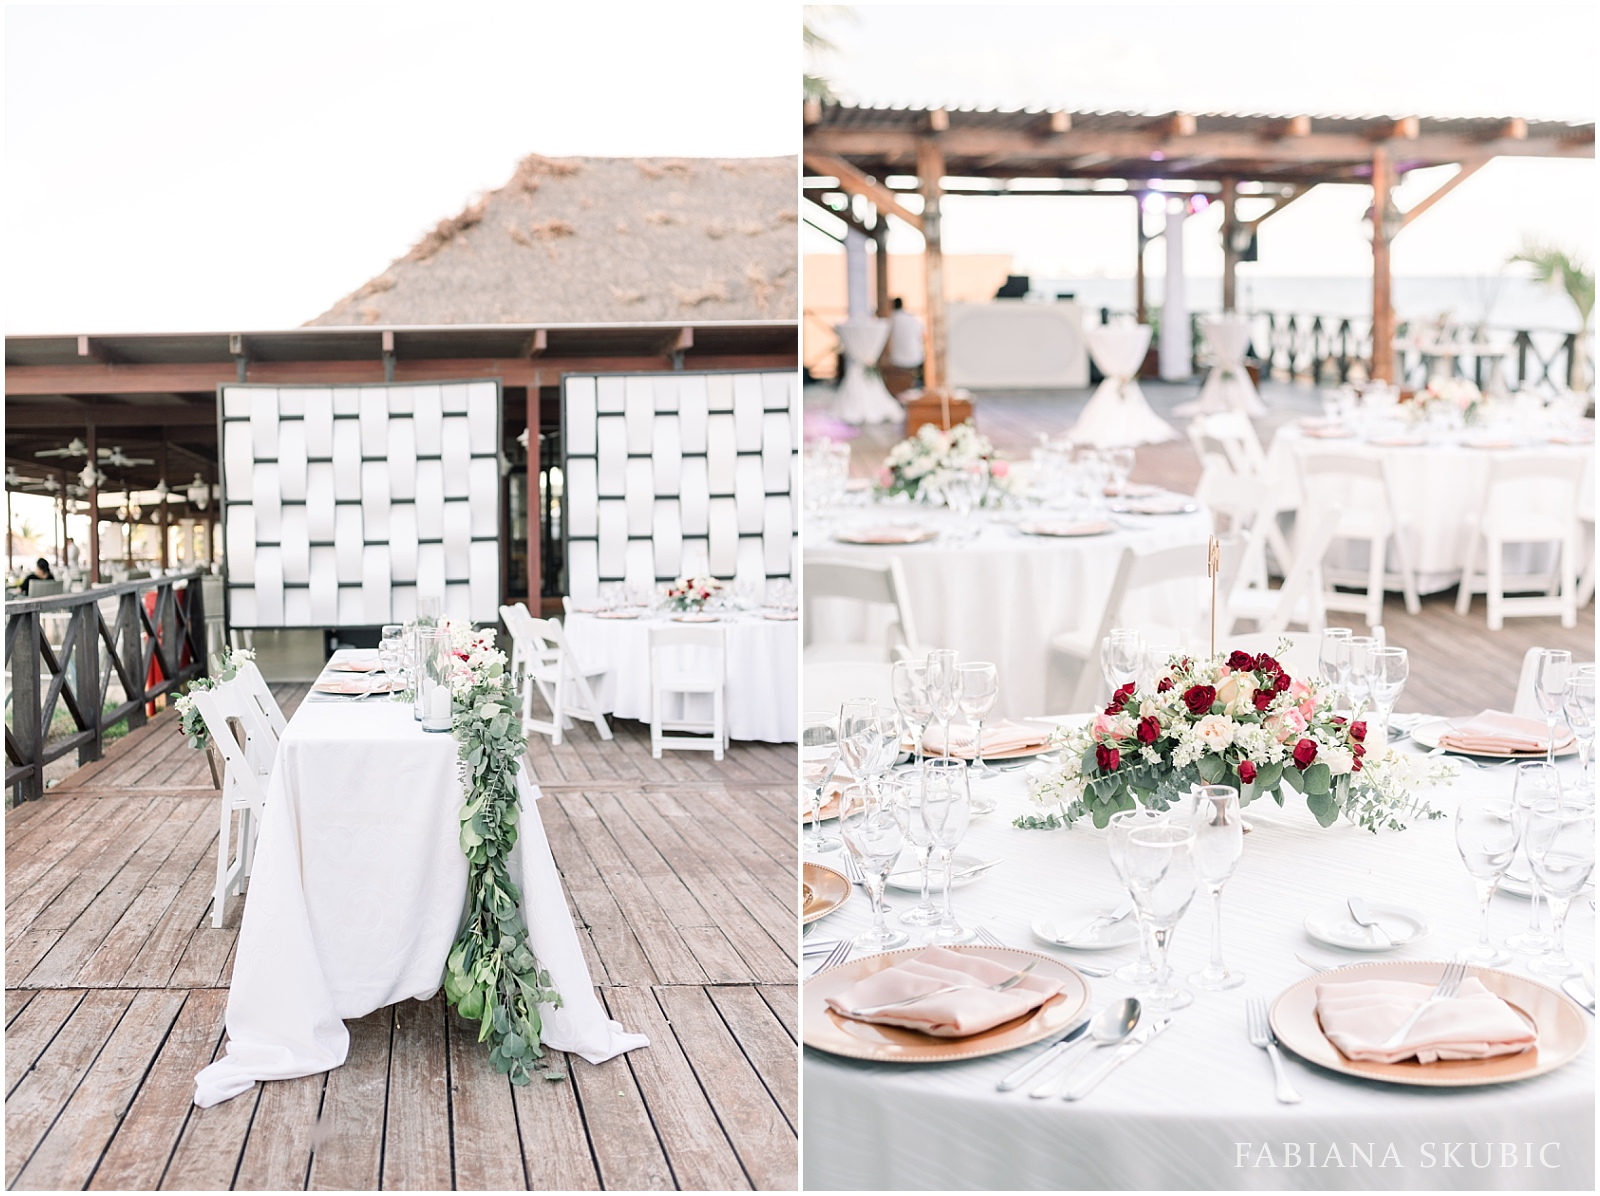 TJ_Now_Sapphire_Riviera_Cancun_Mexico_Wedding_Photos_0260.jpg